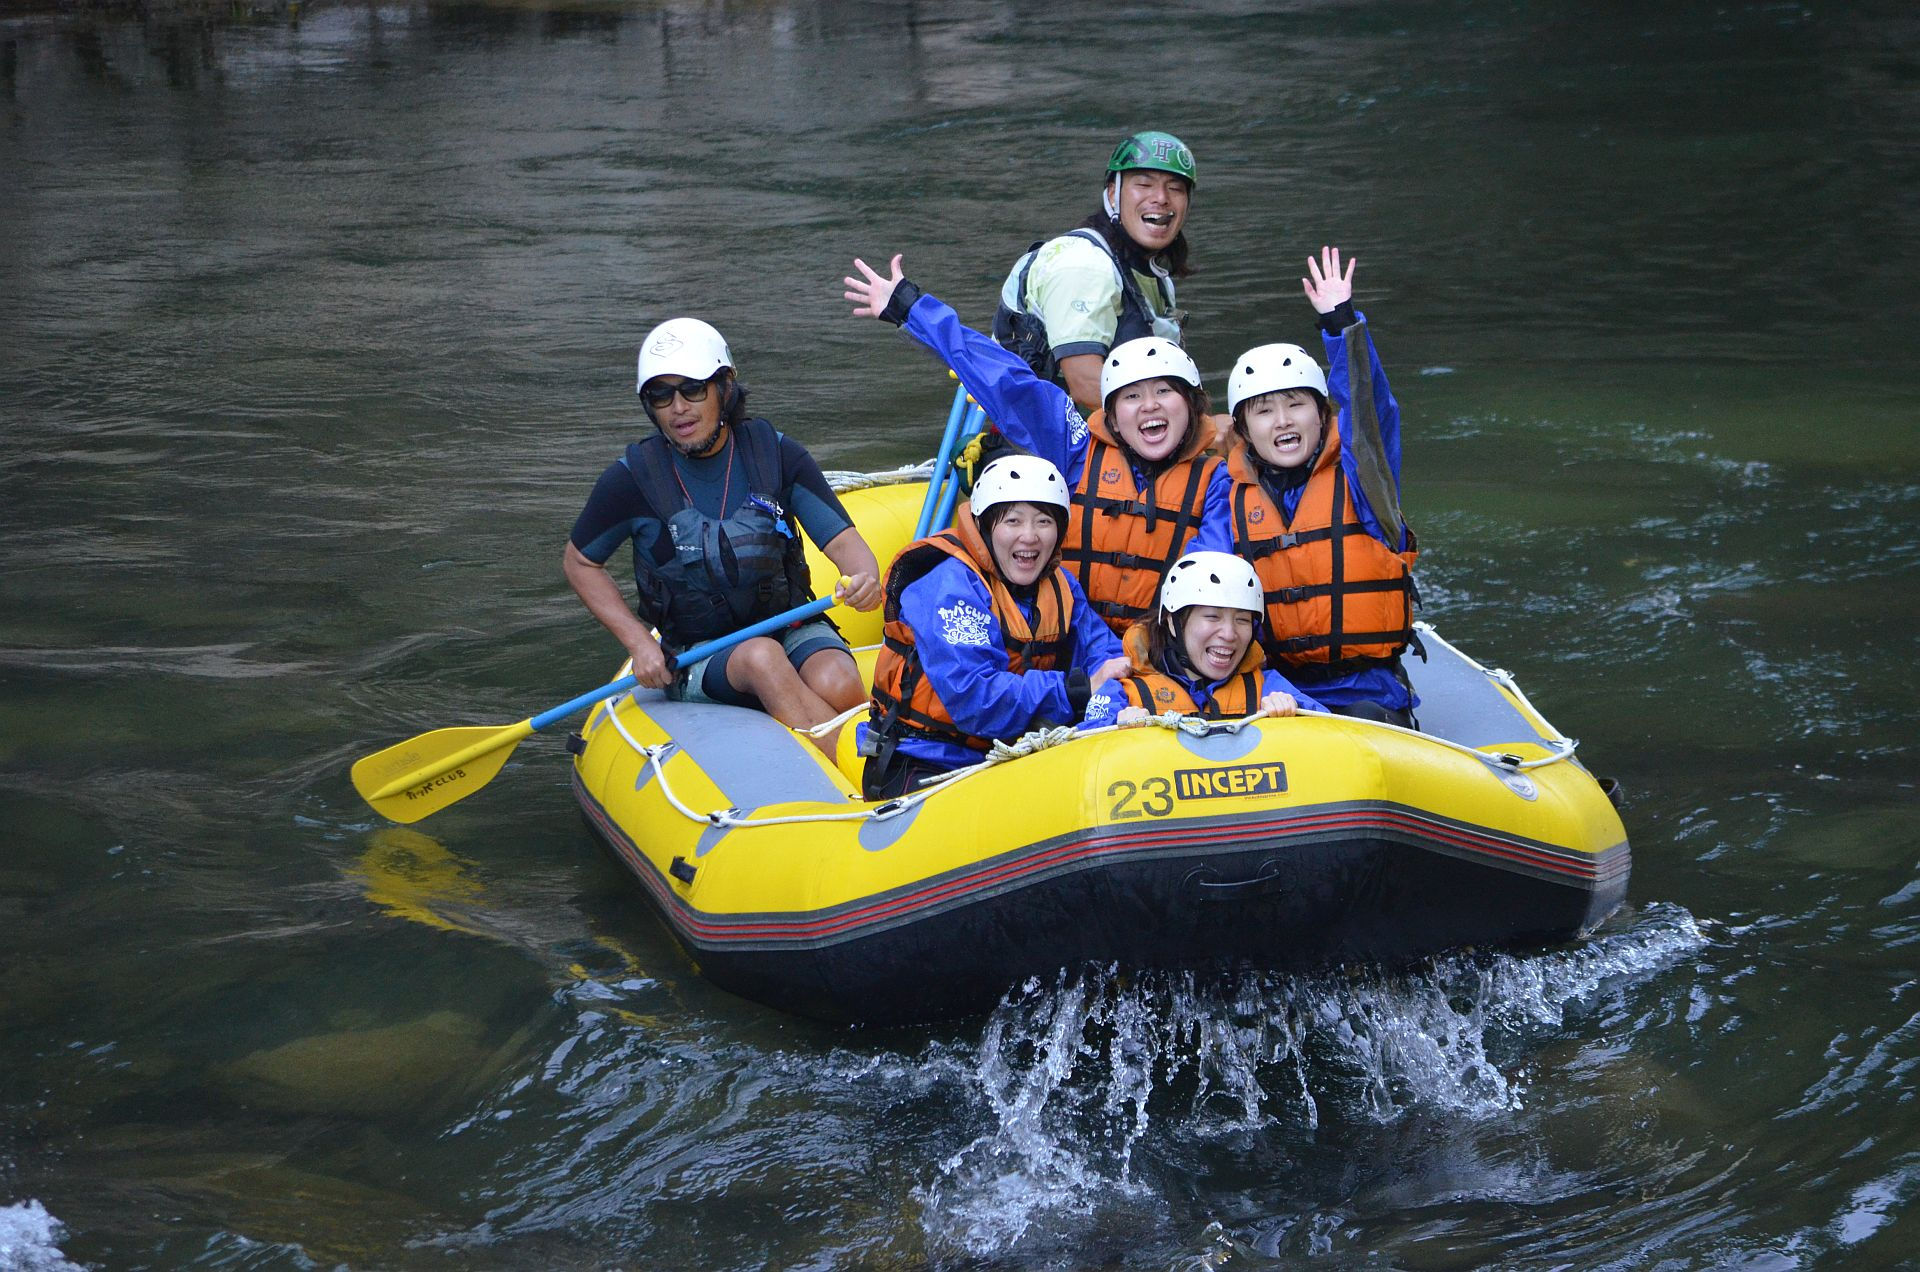 rafting20141007pm-2.jpg